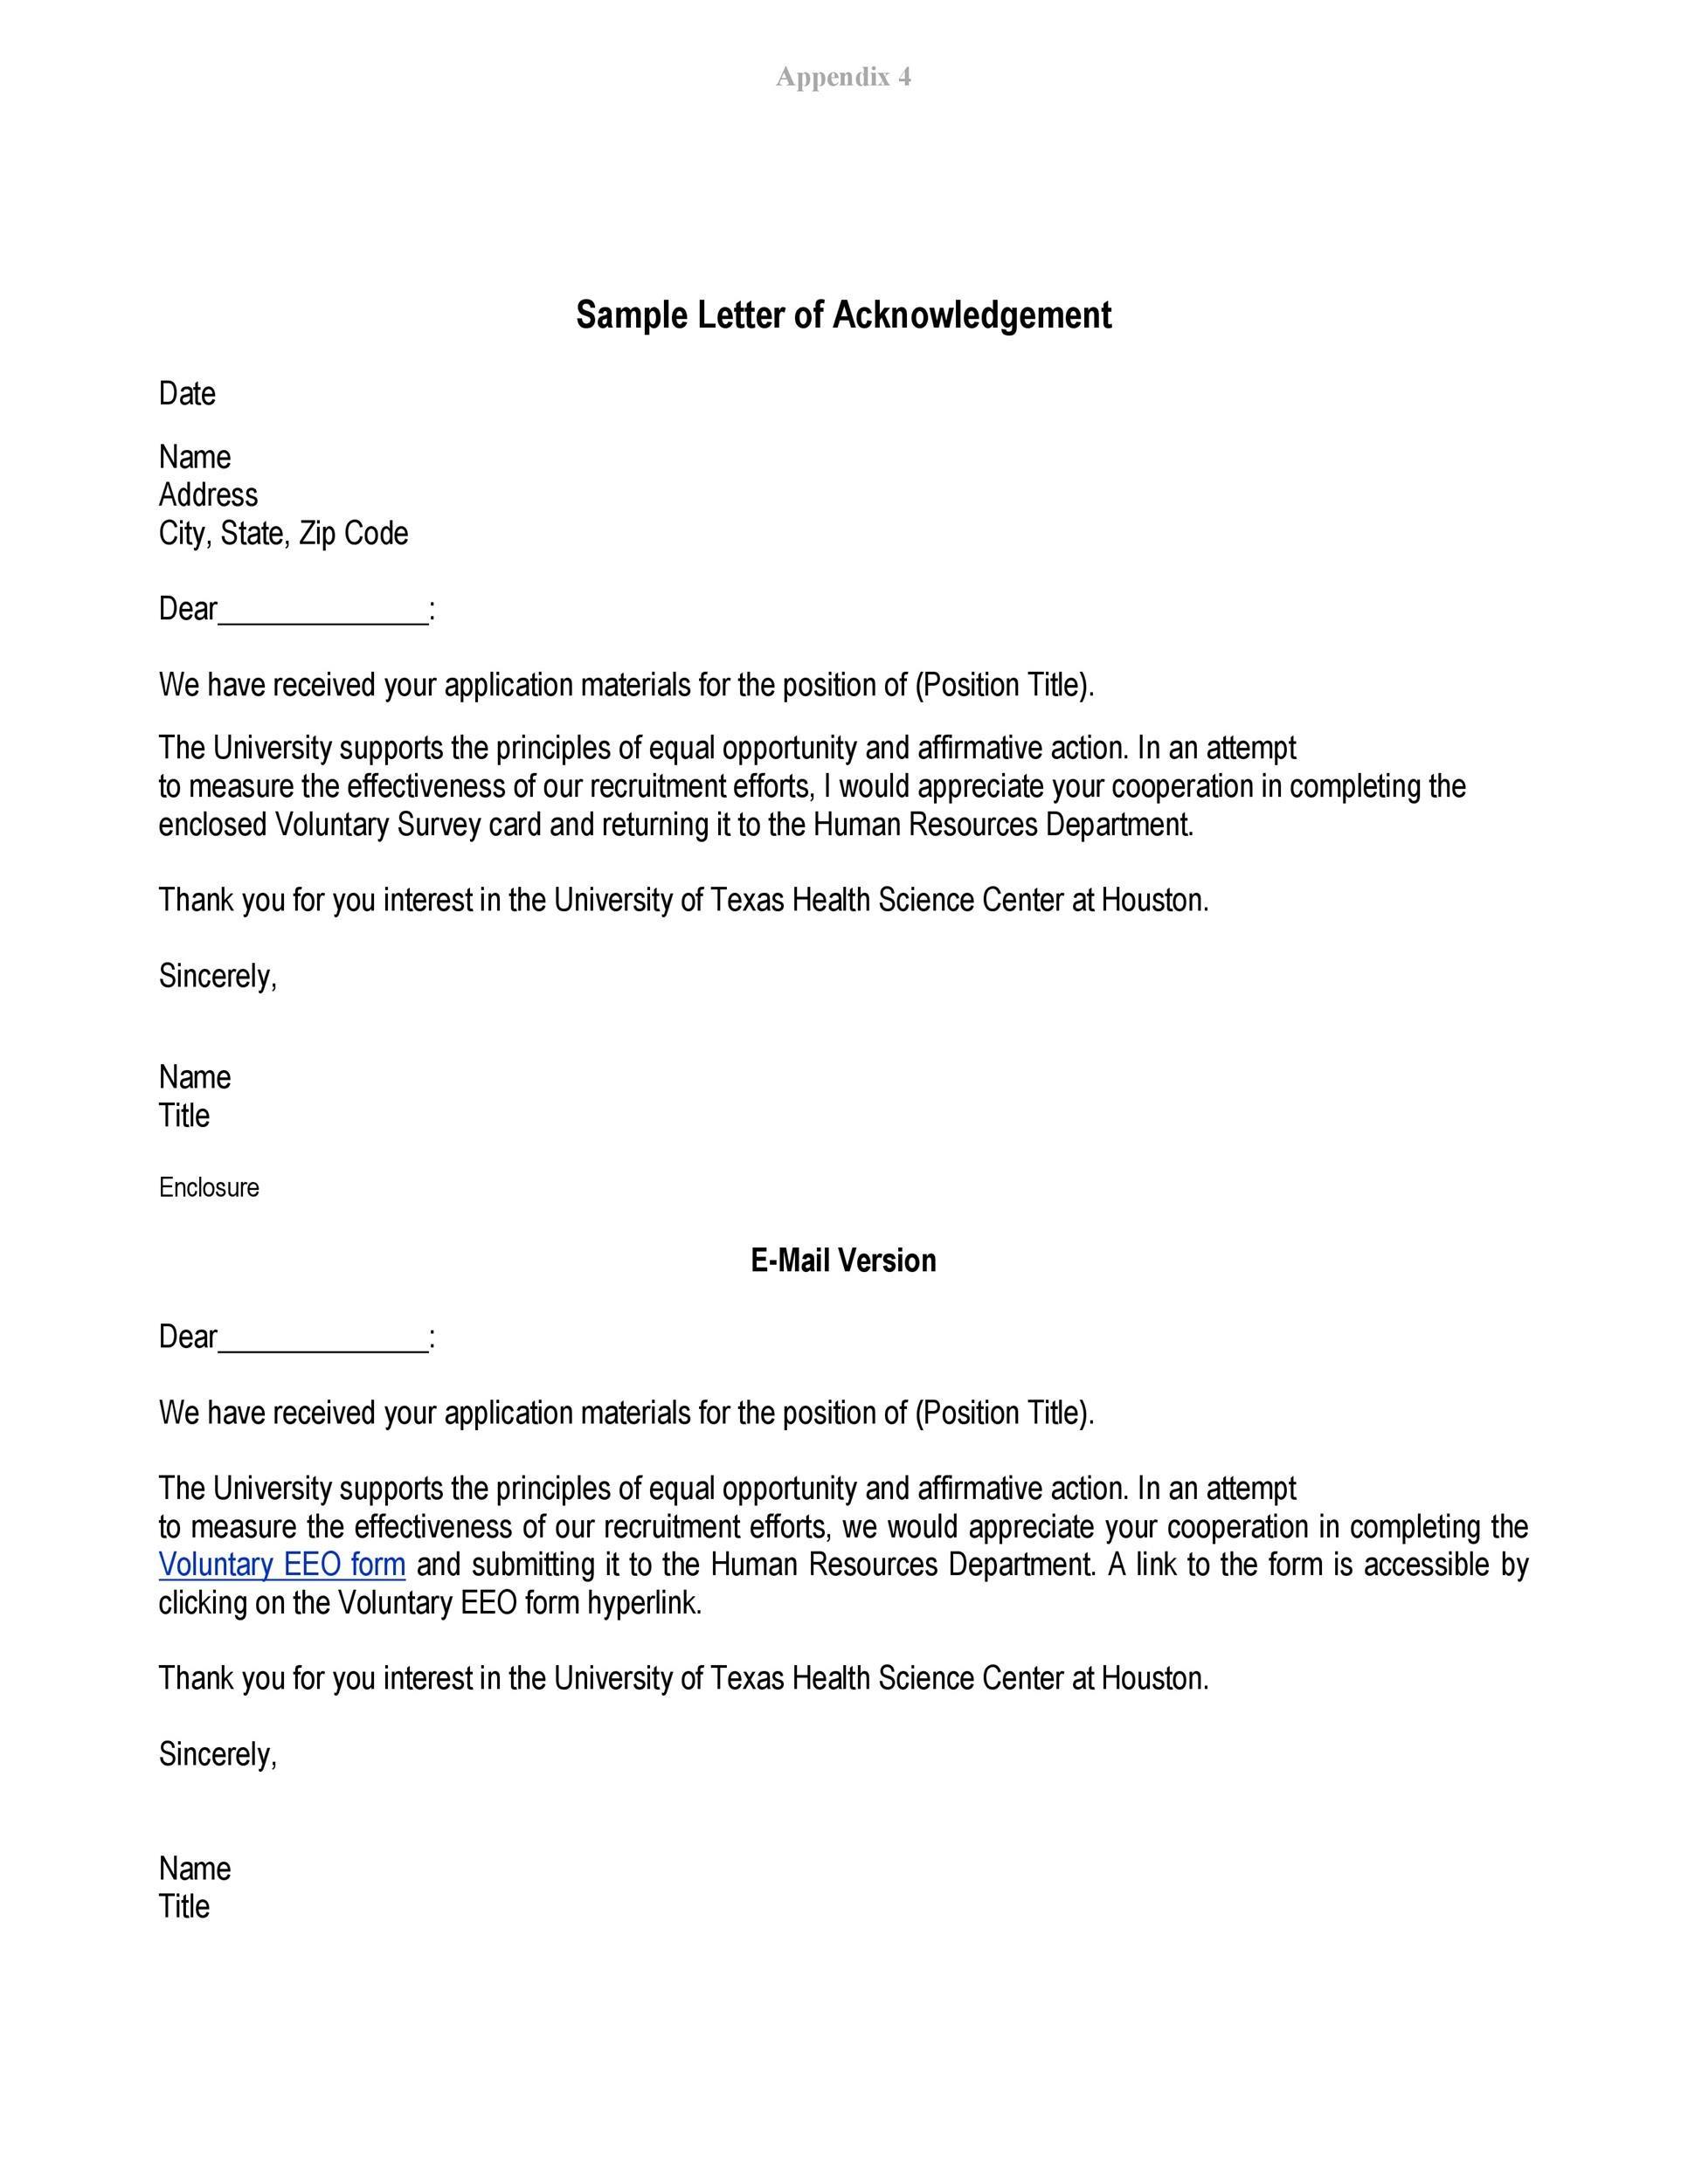 Free acknowledgement sample 07